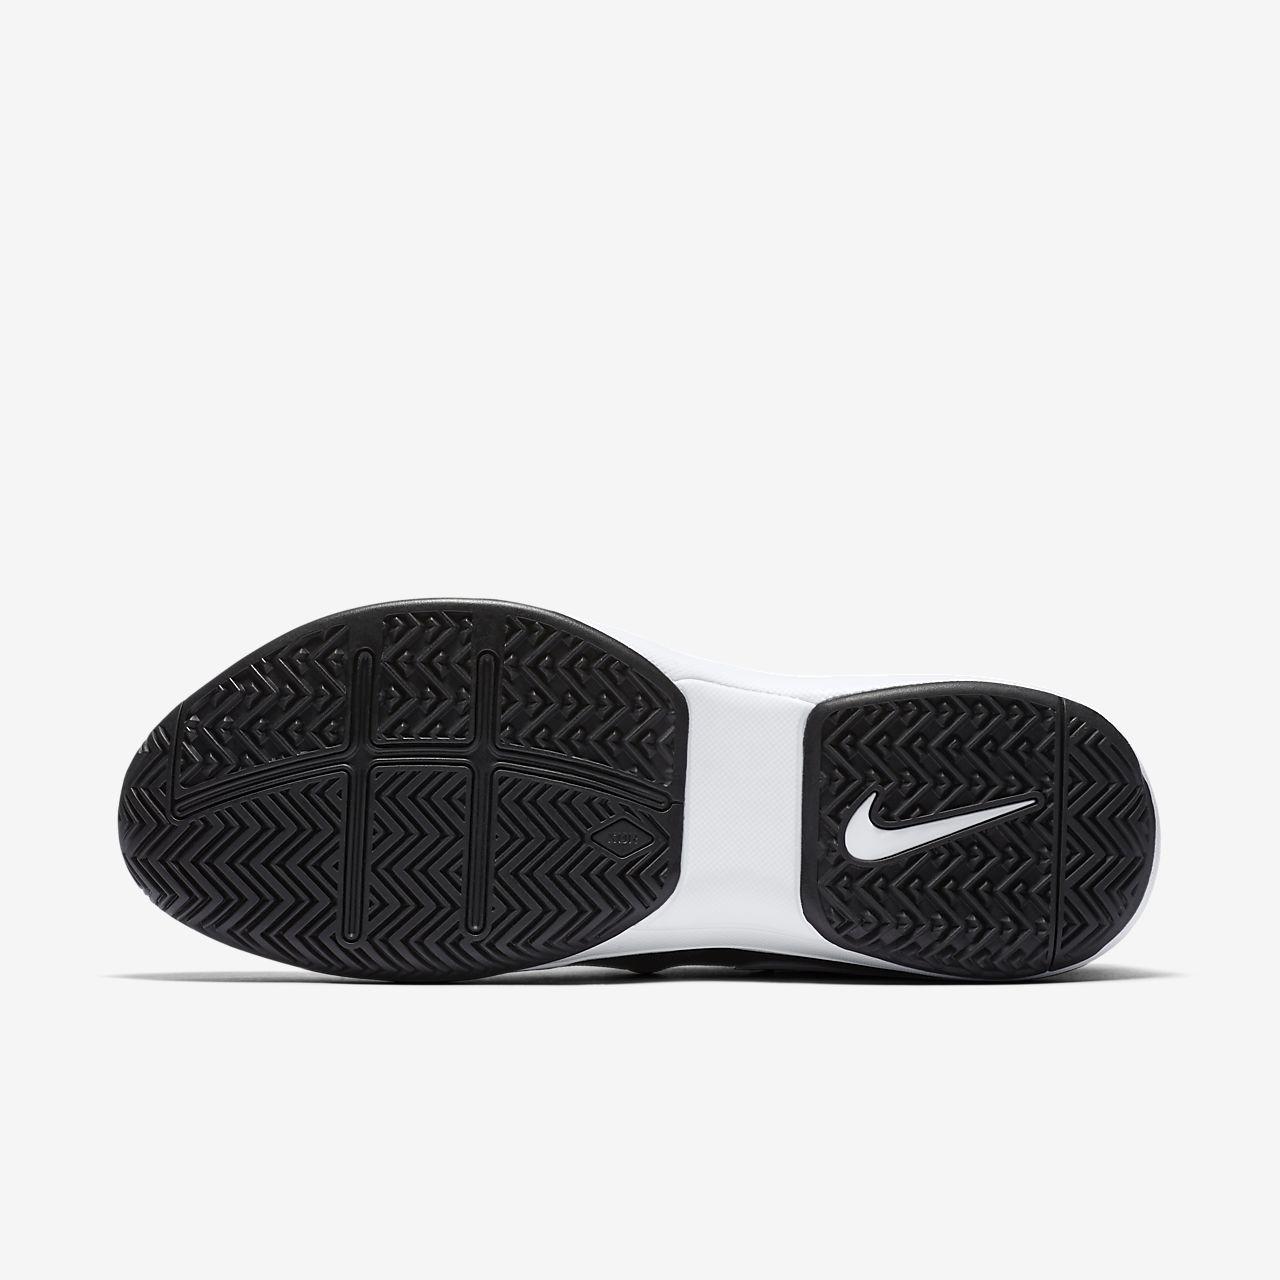 the best attitude d60a7 20490 NikeCourt Air Zoom Prestige Hardcourt tennisschoen voor heren. Nike ...